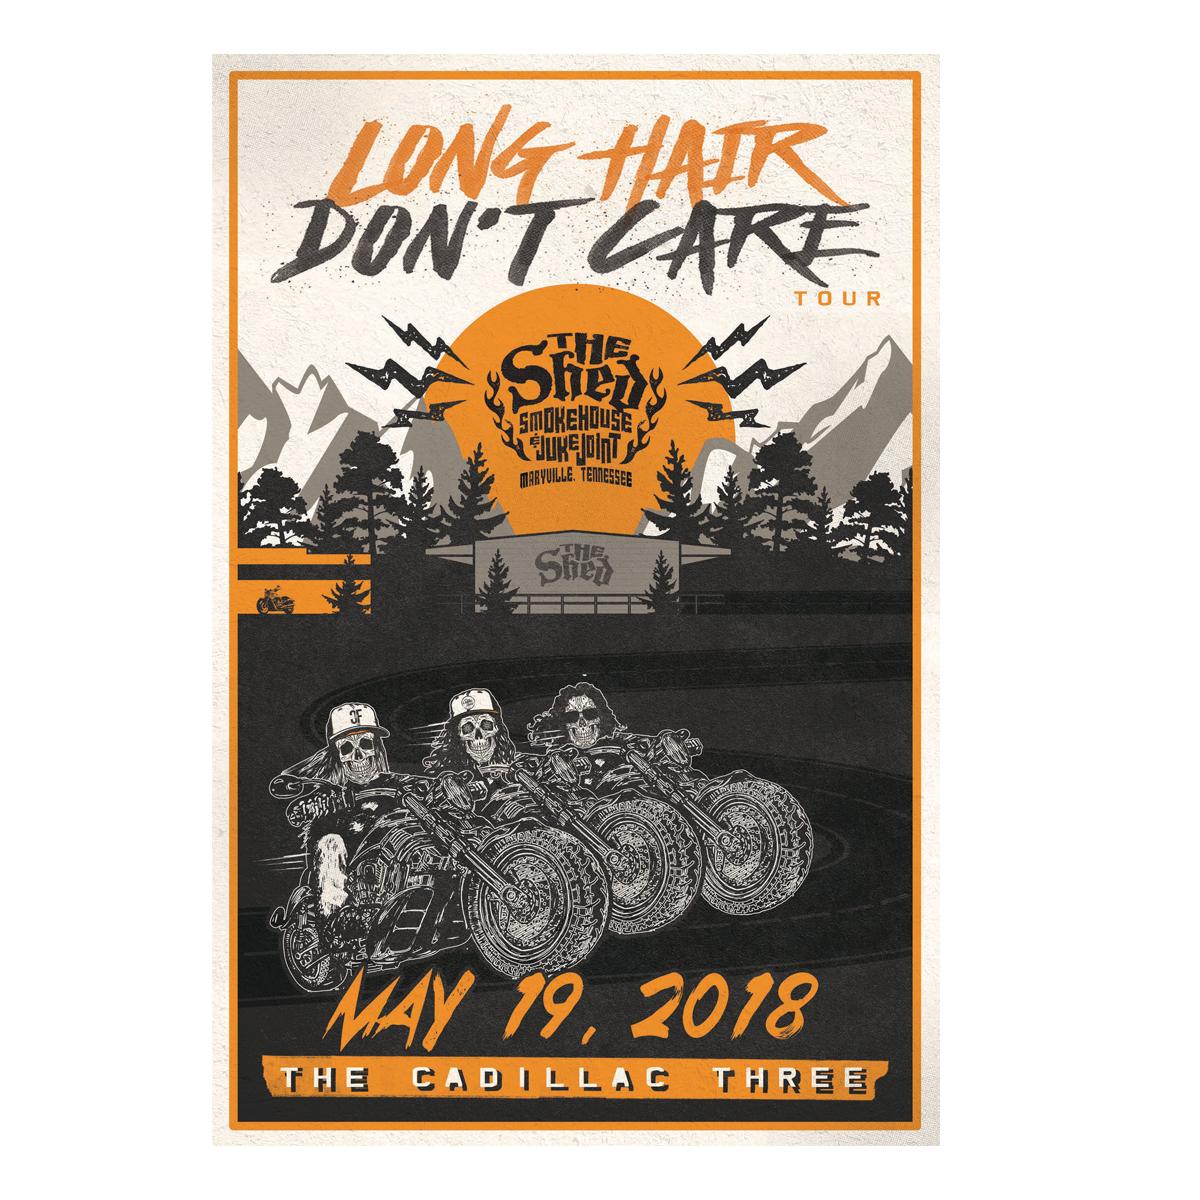 TC3 Long Hair Don't Care Poster